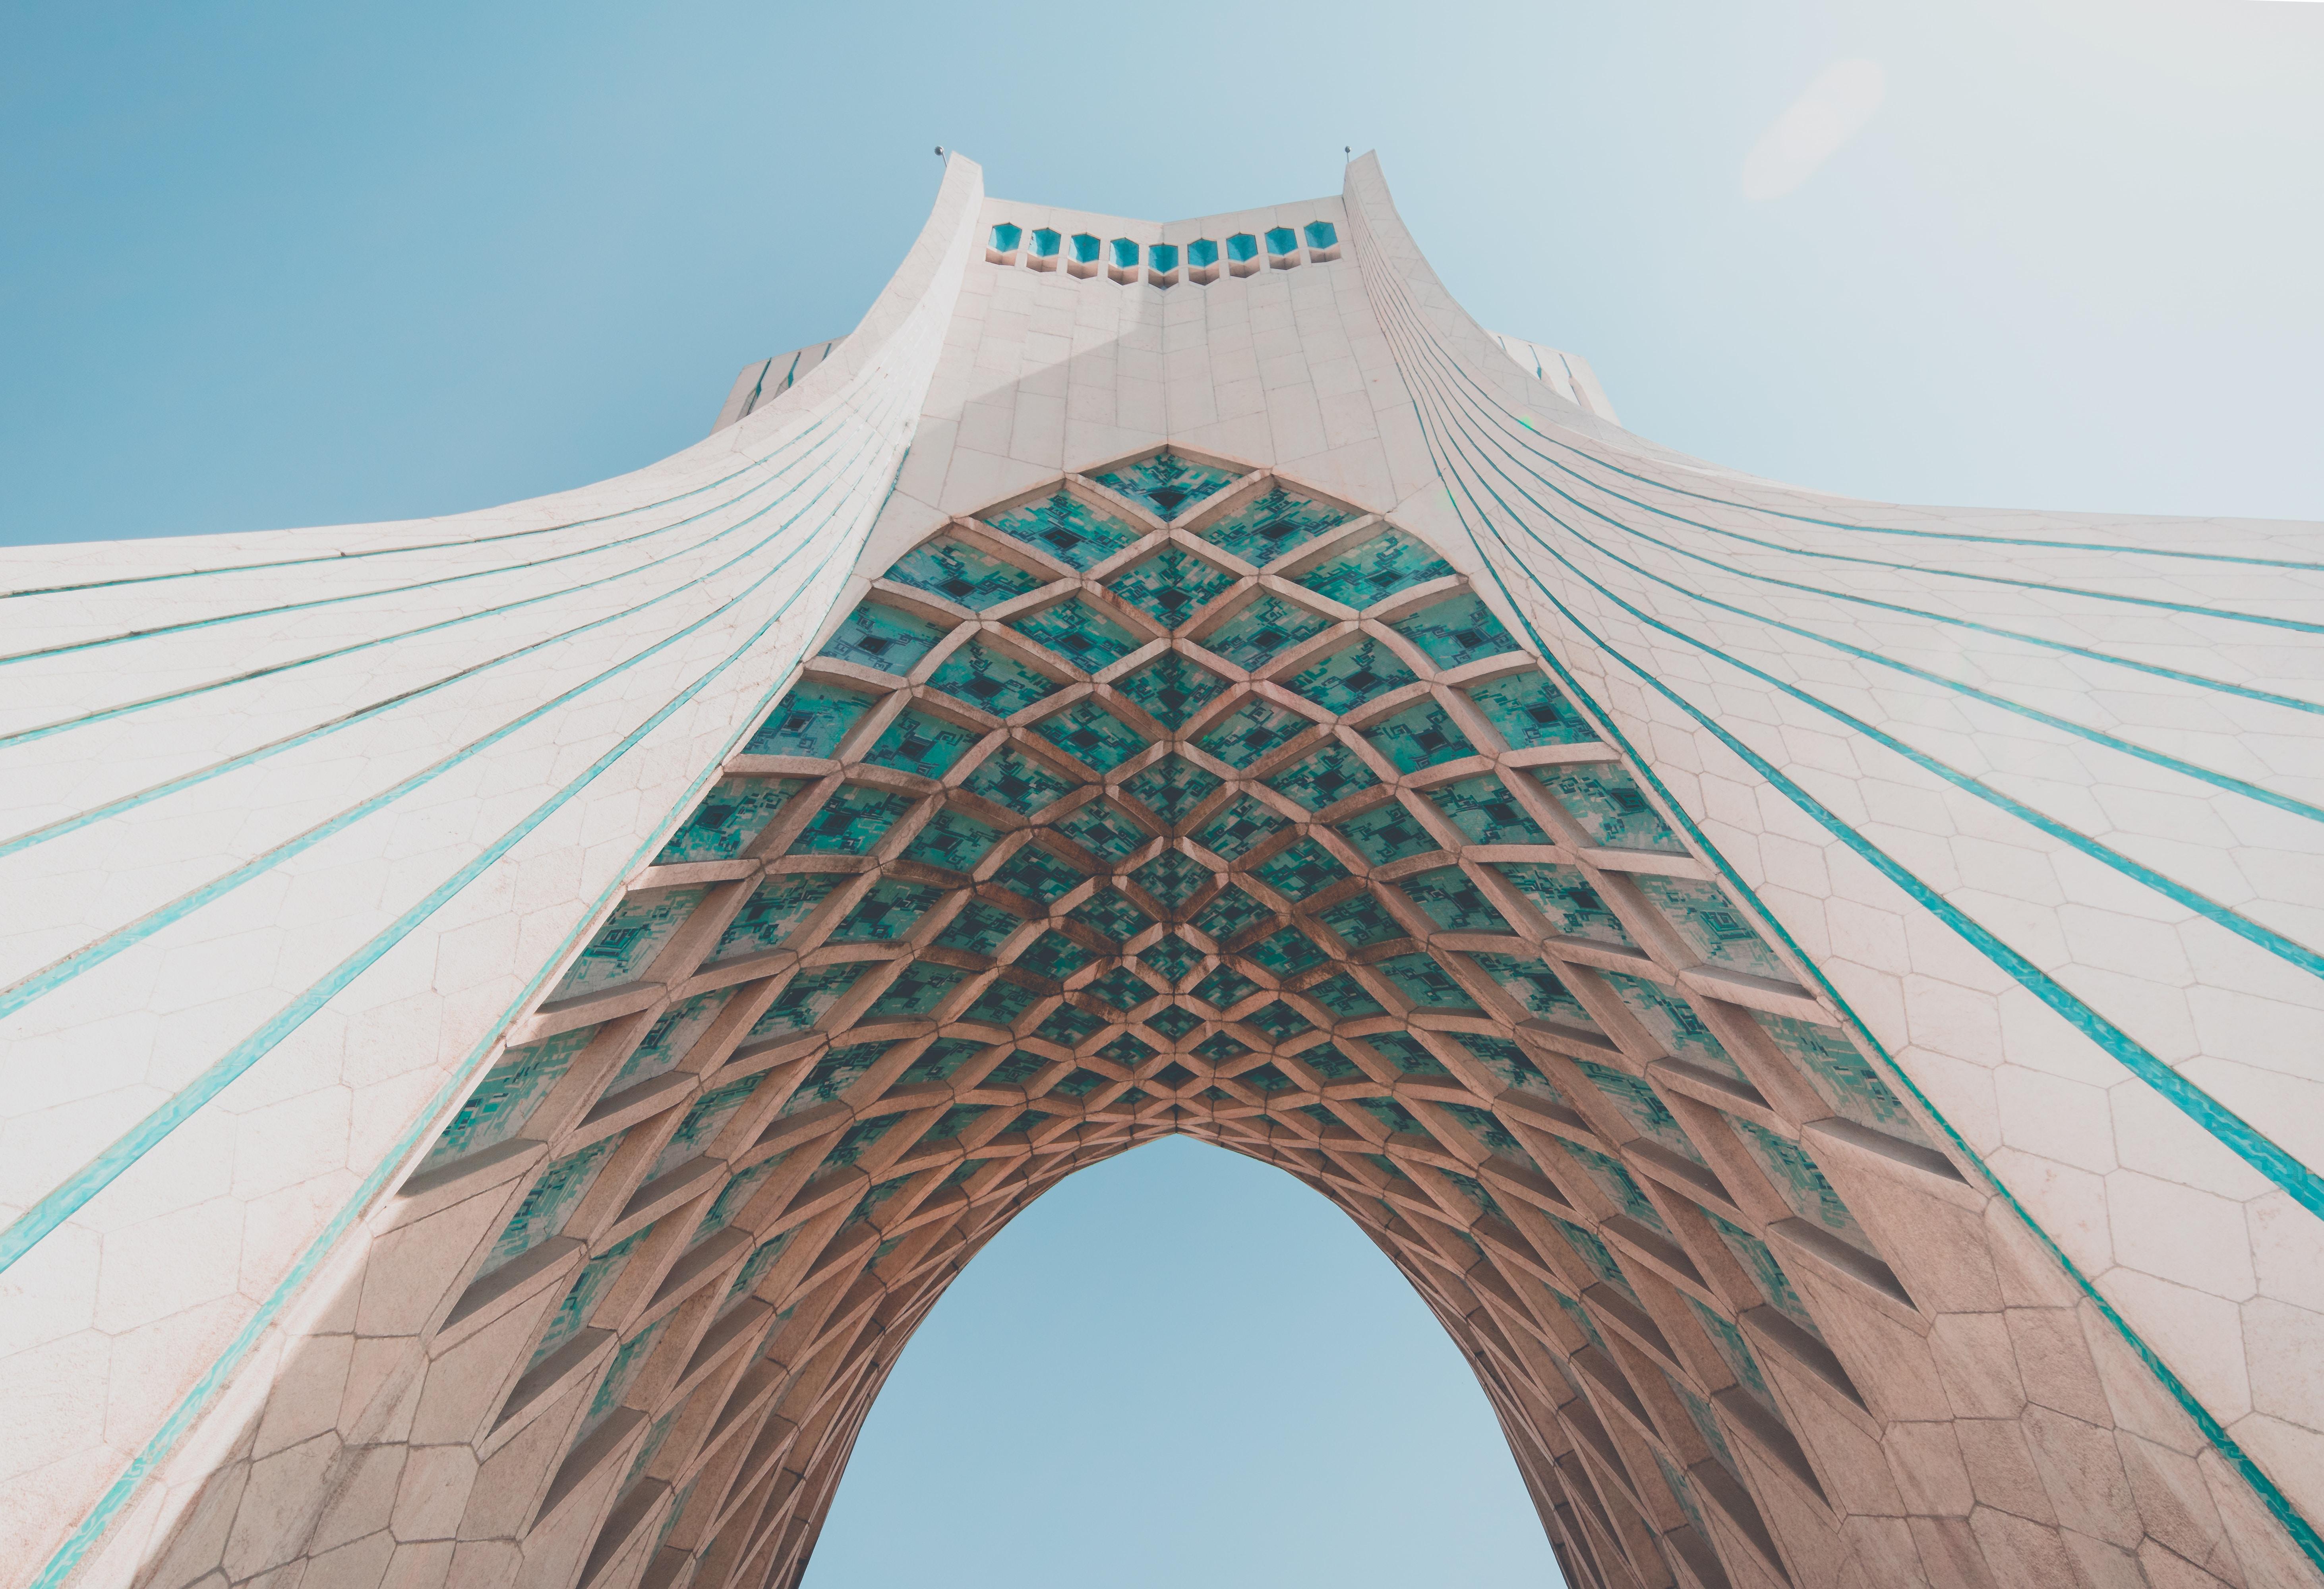 Azadi Tower Tehran Iran Pictures | Download Free Images on Unsplash